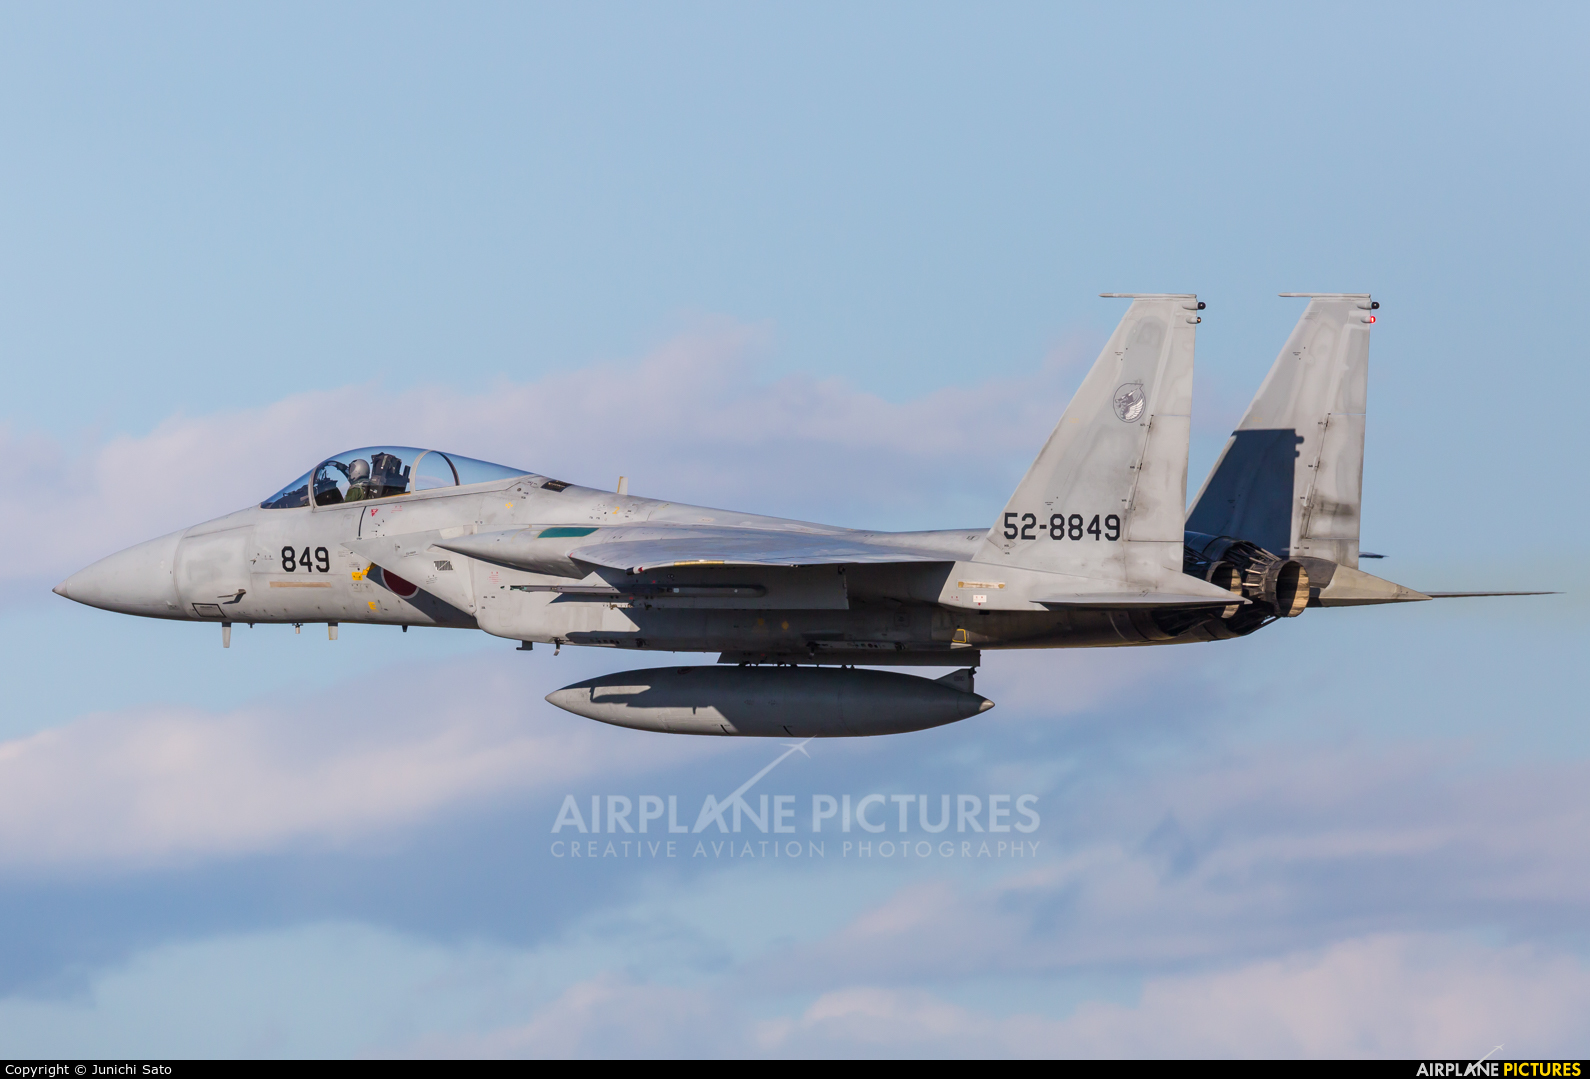 Japan - Air Self Defence Force 52-8849 aircraft at Iruma AB